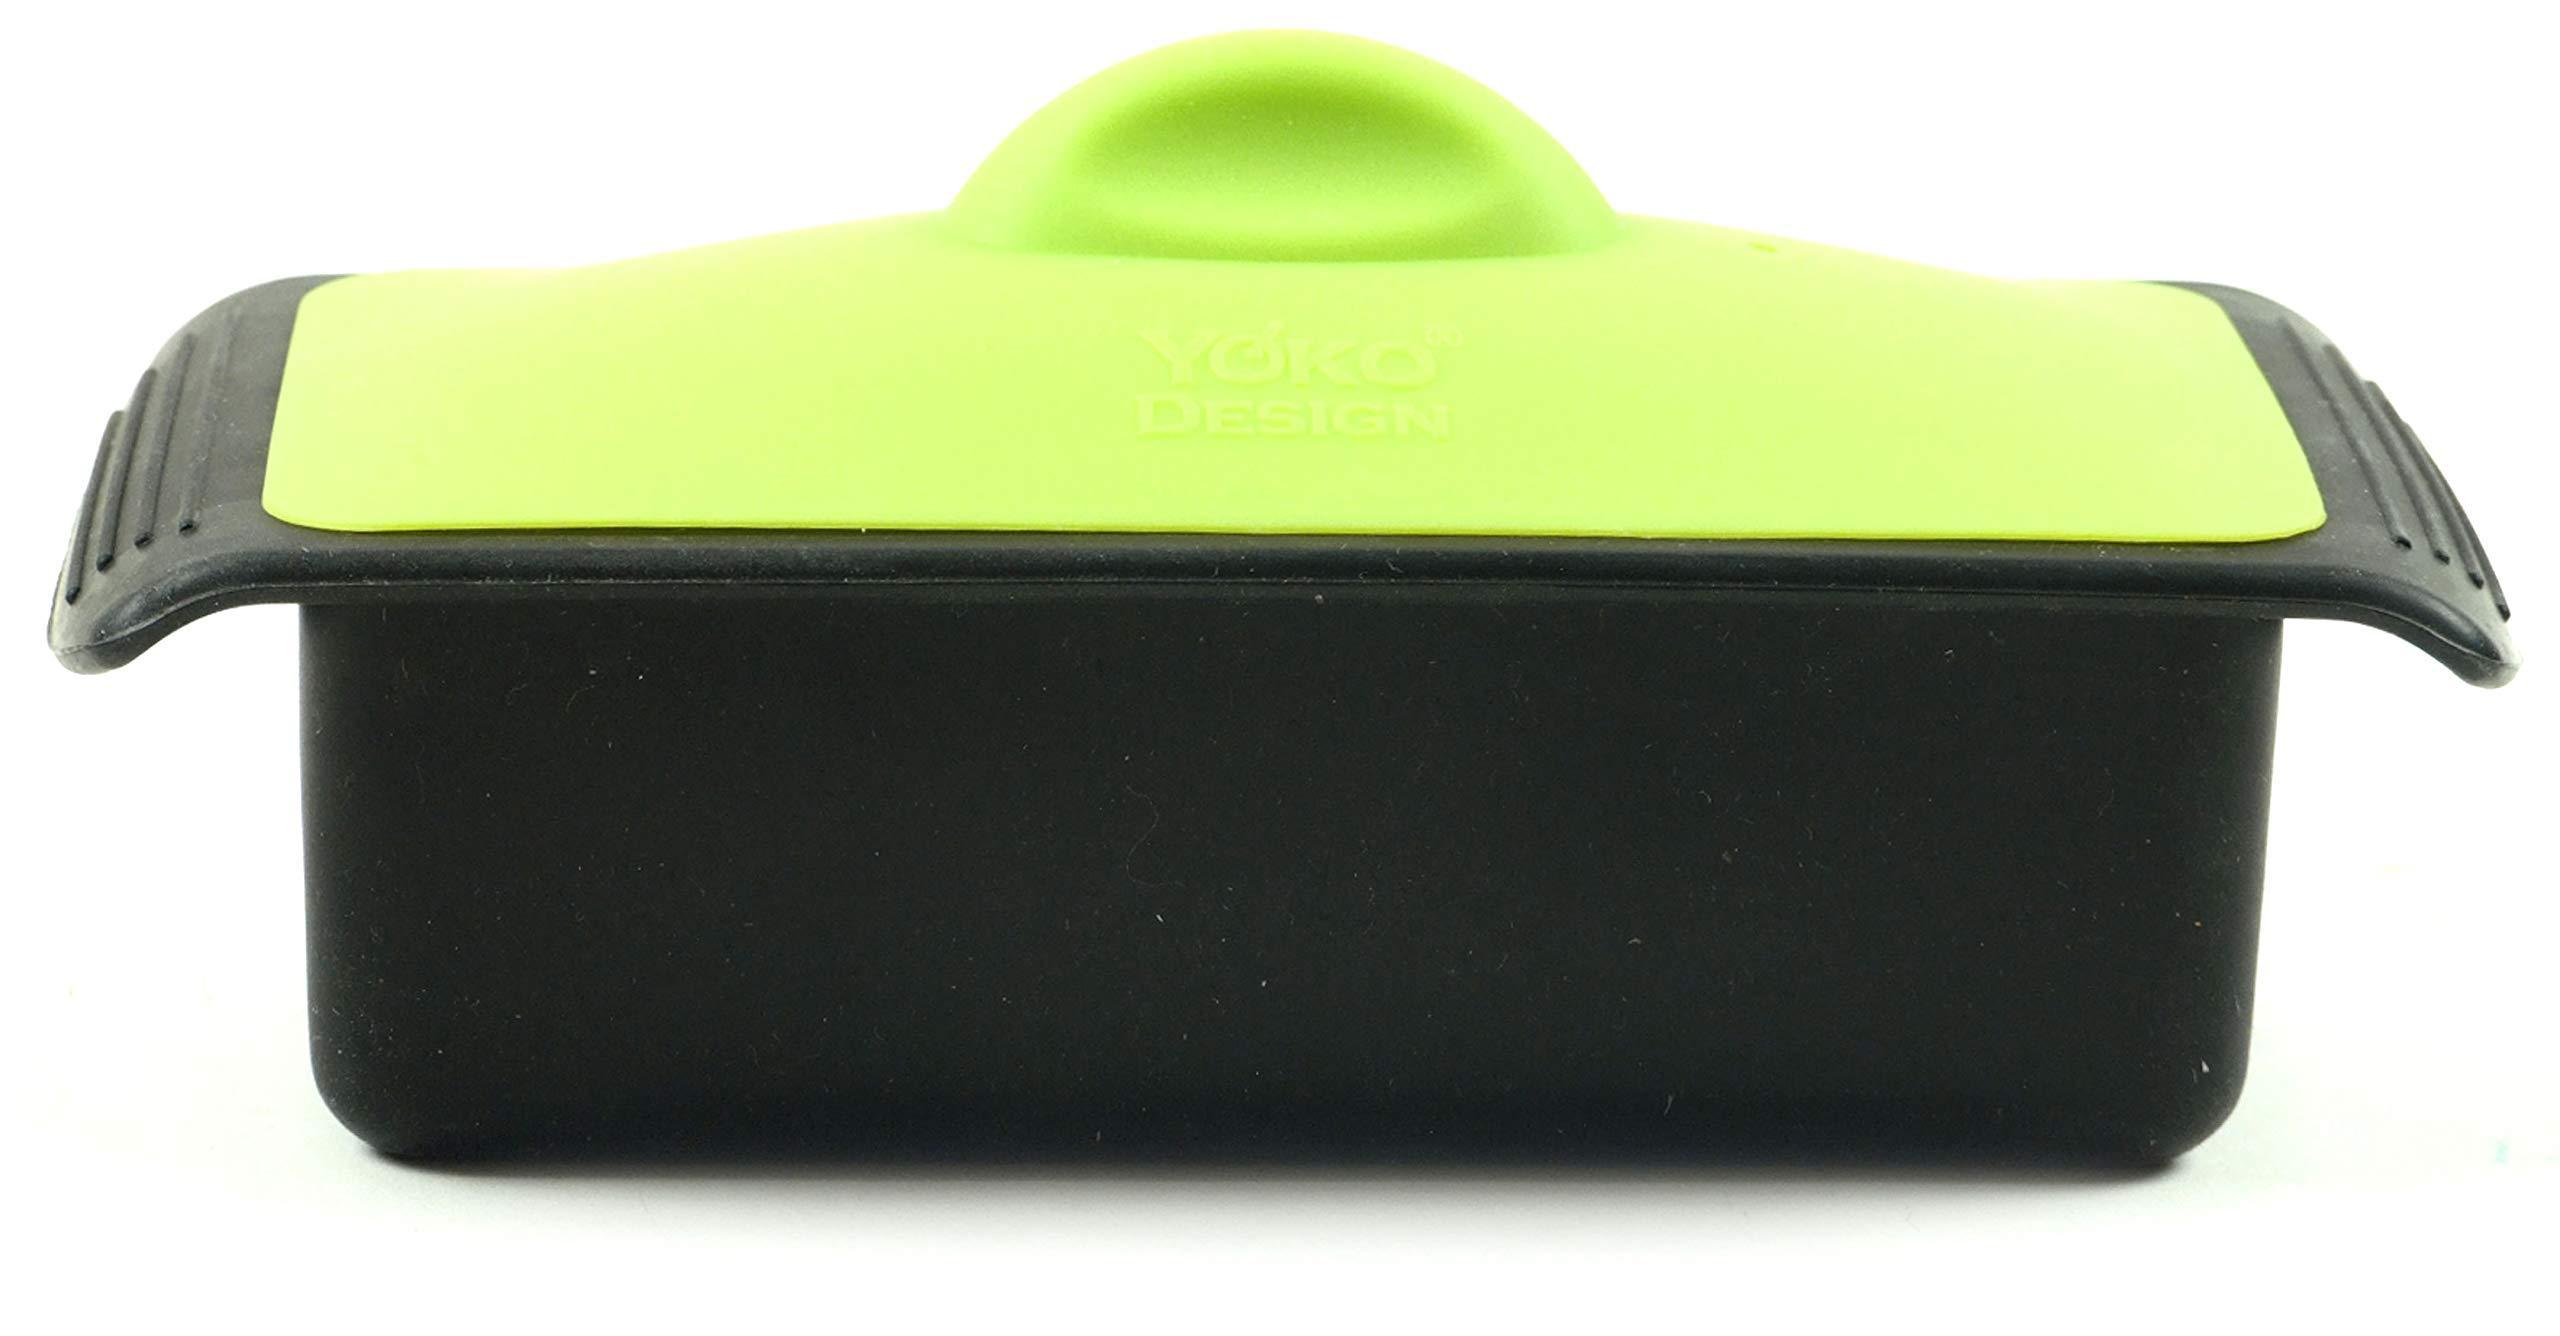 YOKO Design 1101 Terrine + Press, Silicone, Green, 19 x 10 x 6 cm by YOKO Design